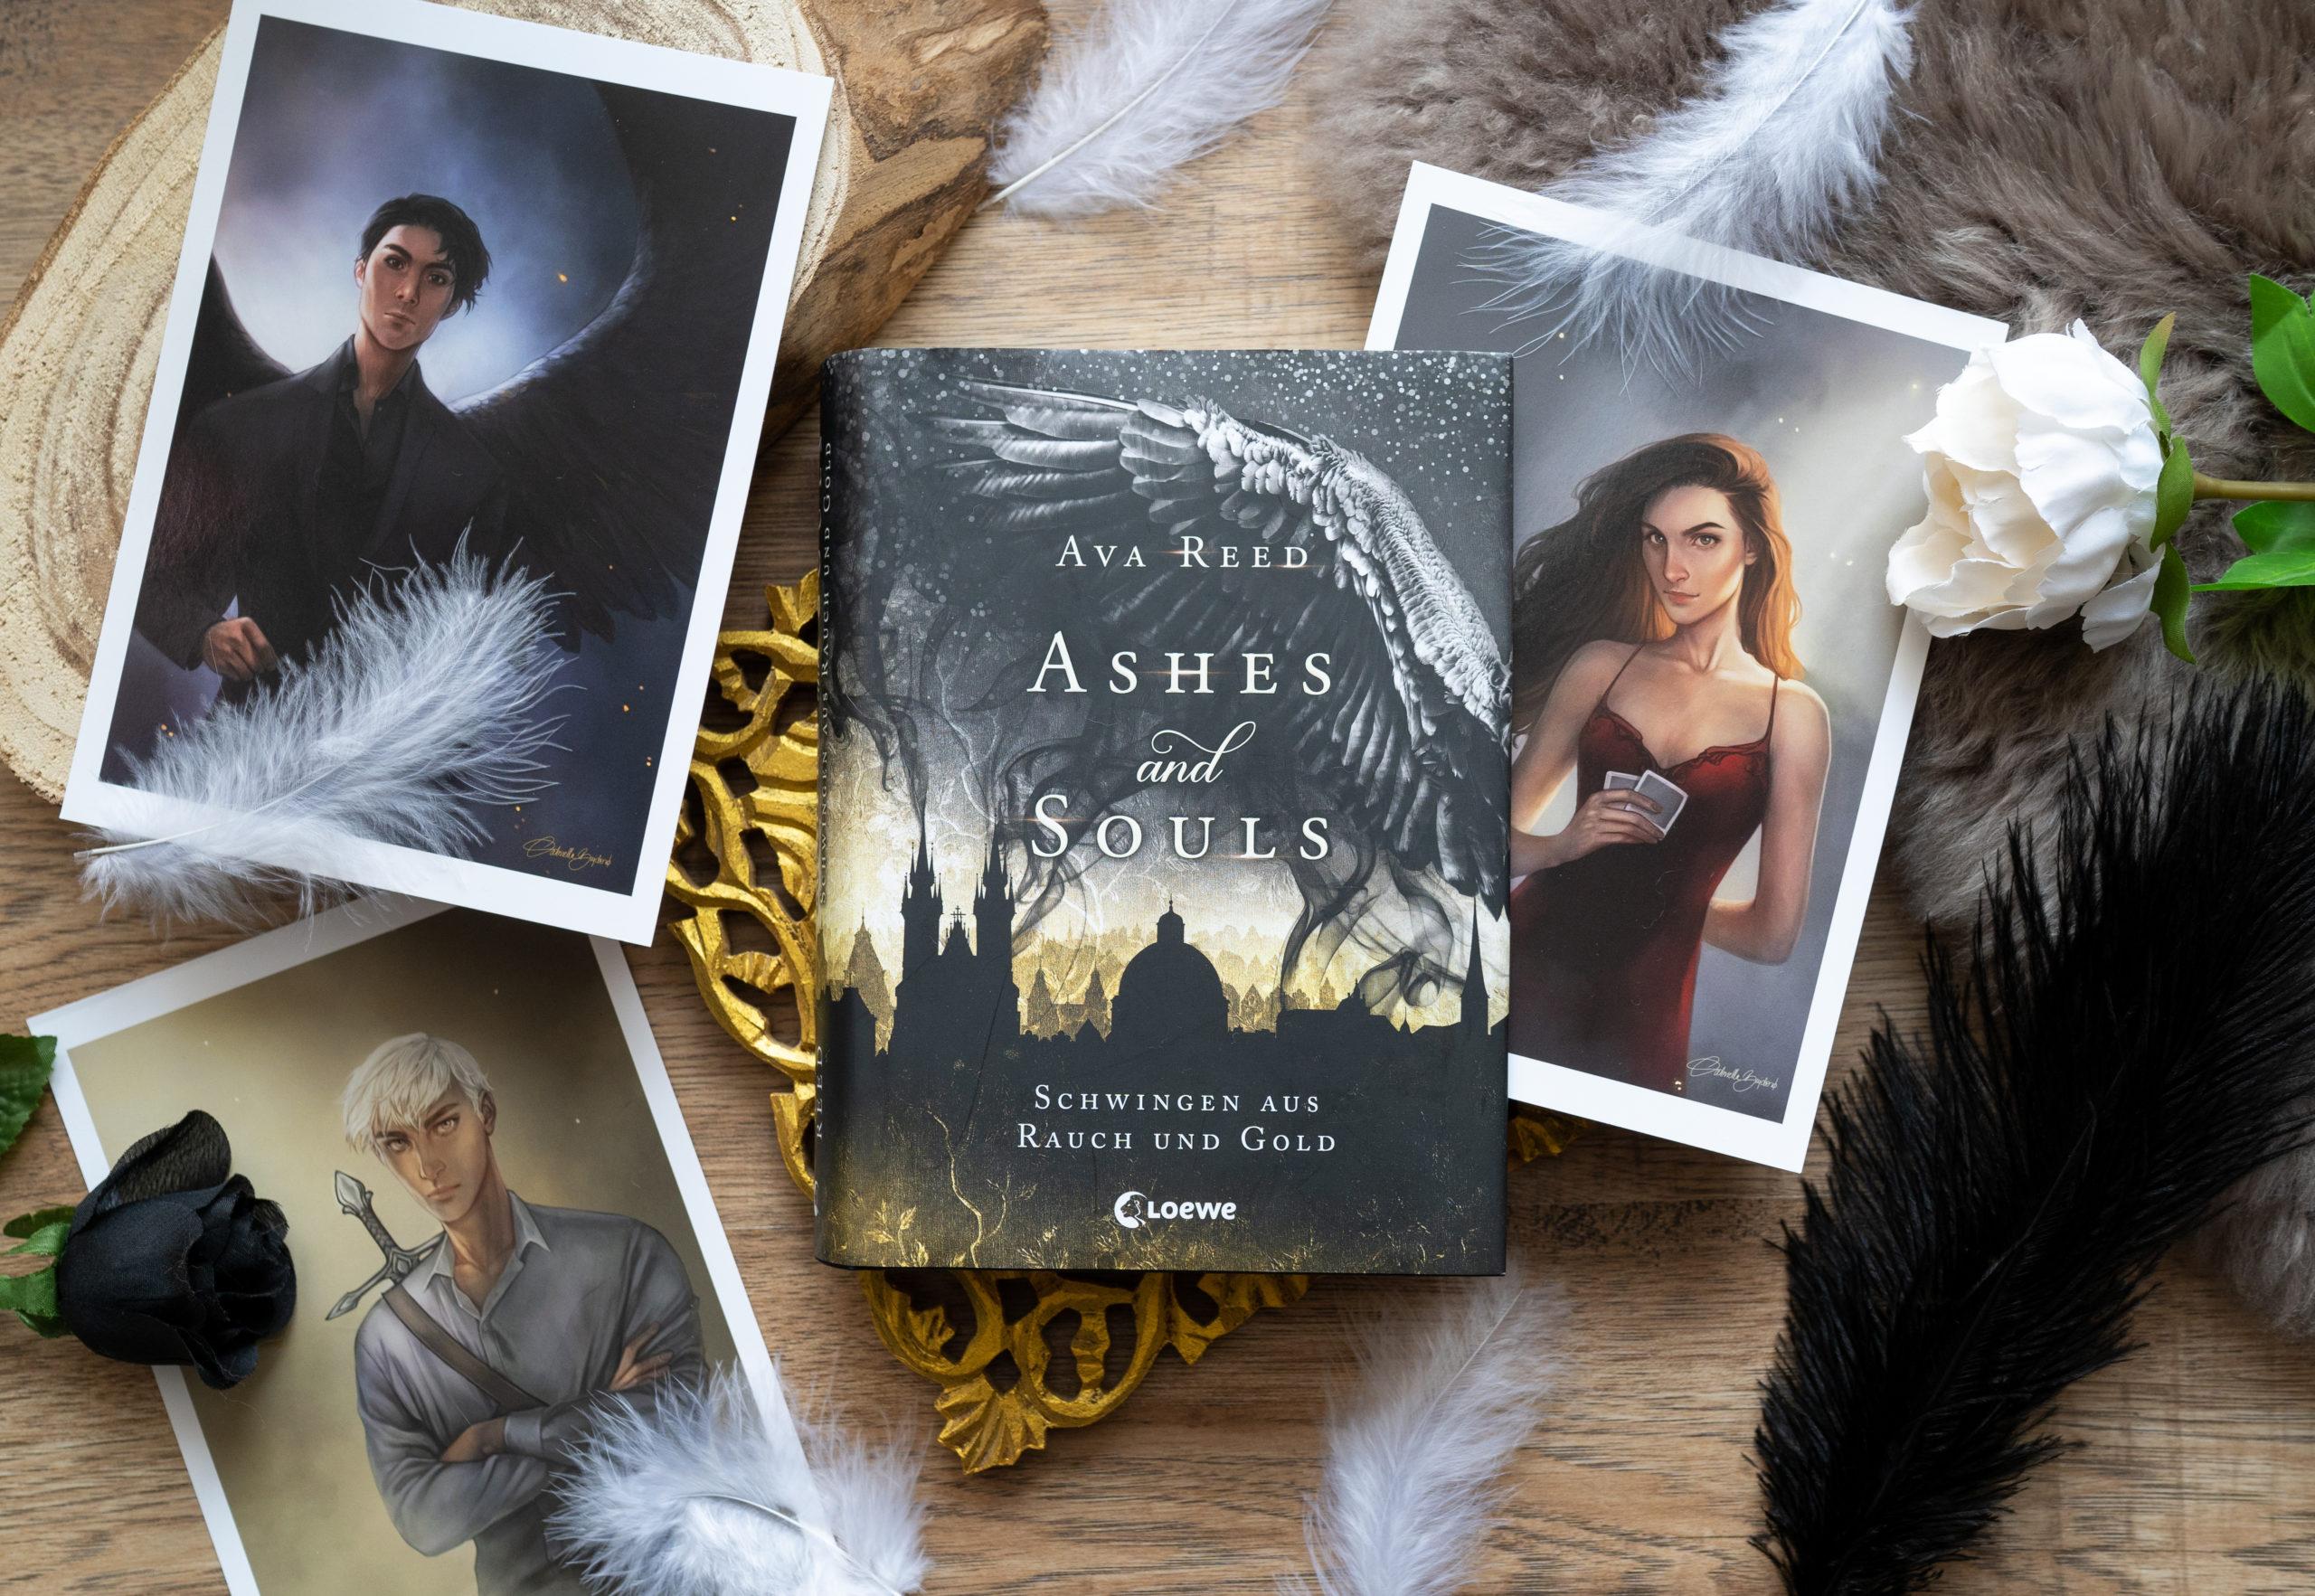 Ashes and Souls: Schwingen aus Rauch und Gold – Ava Reed graphic